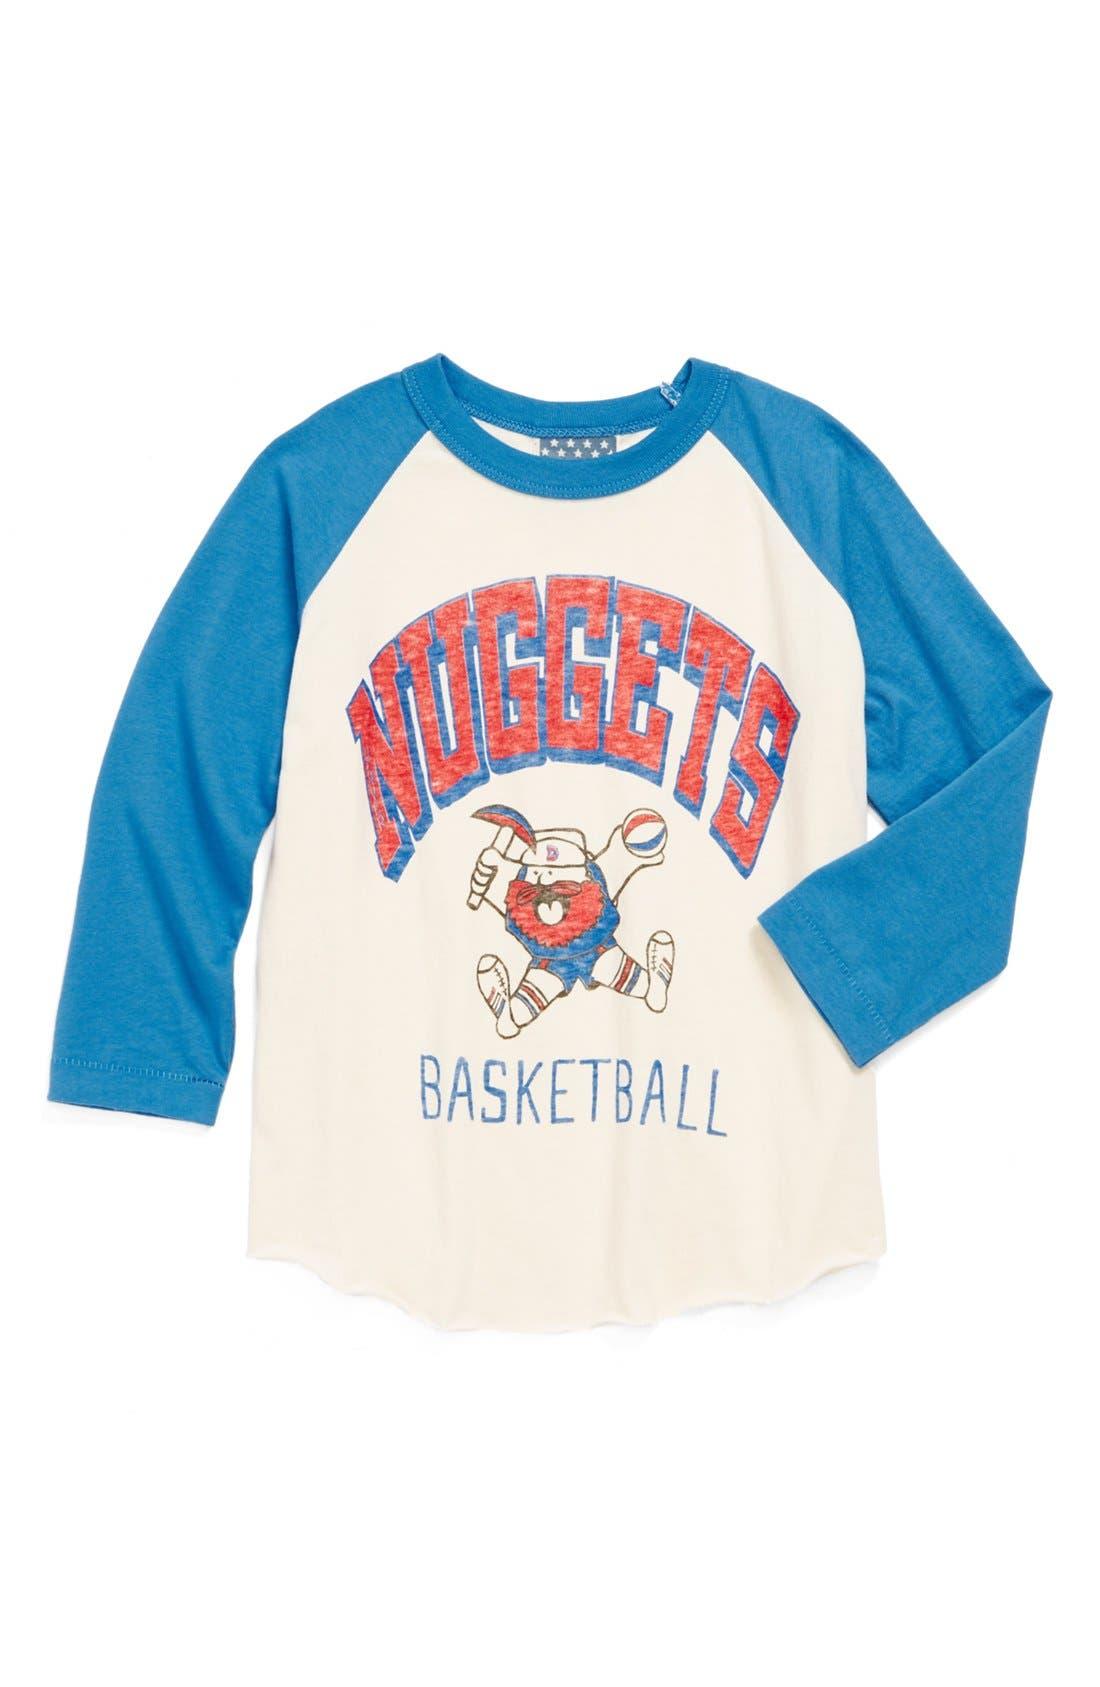 Alternate Image 1 Selected - Junk Food 'Denver Nuggets' Long Sleeve T-Shirt (Little Boys & Big Boys)